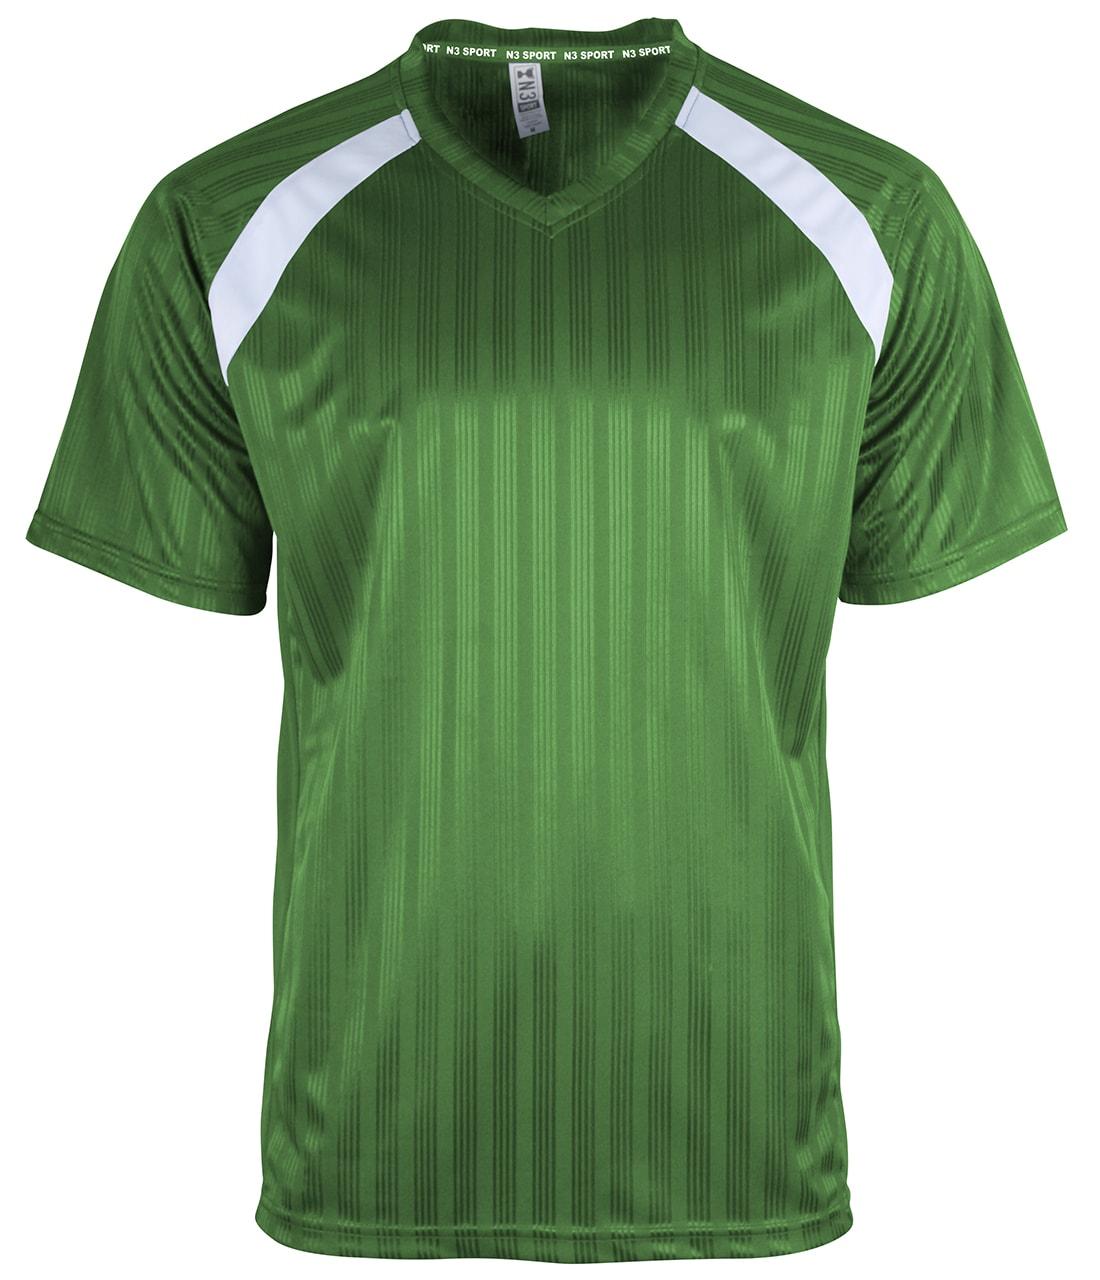 N3 Sport Adult Soccer